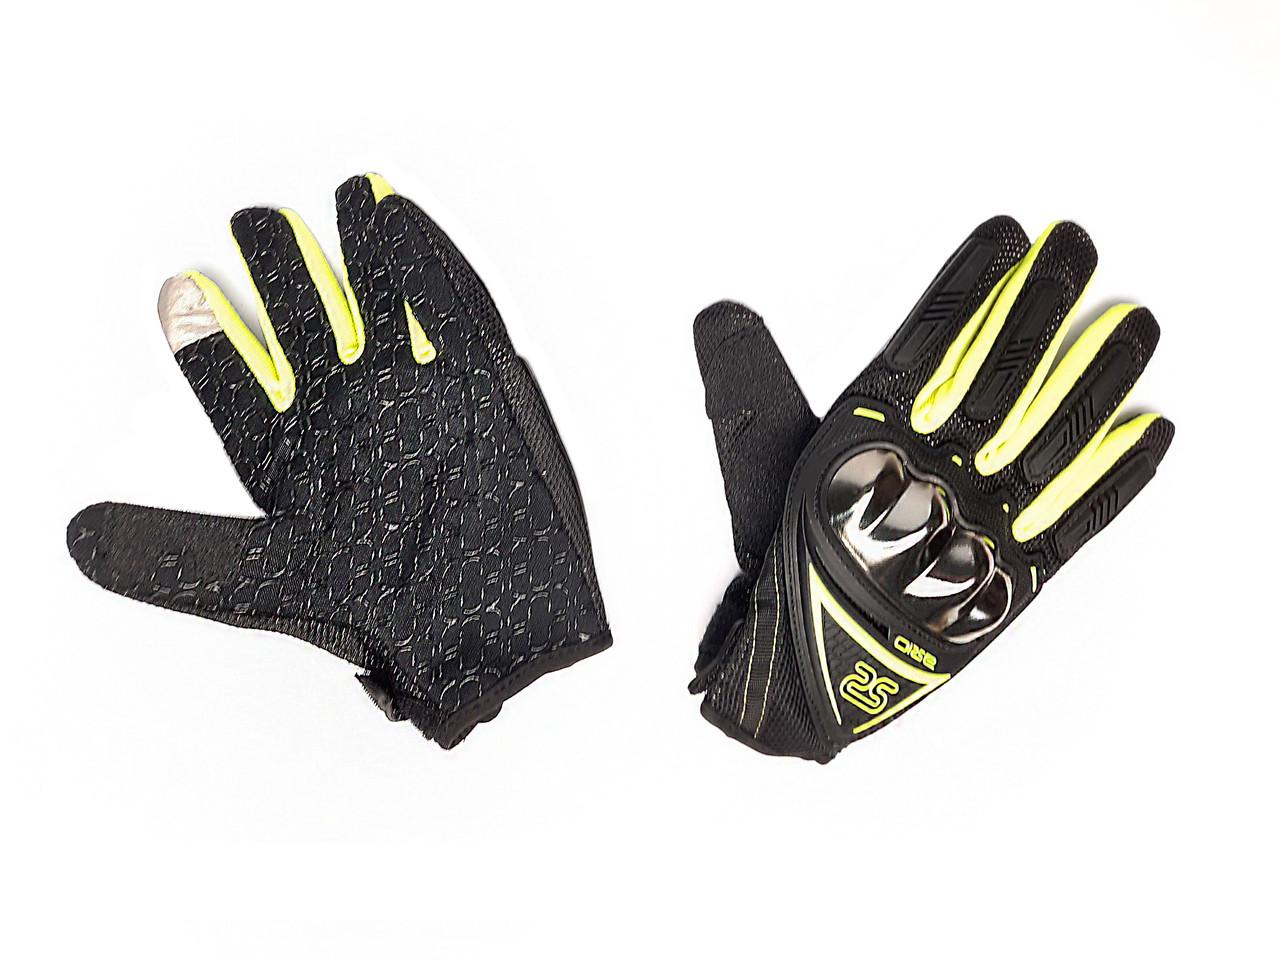 Перчатки AXIO AX-01 сенсорный палец (size: M, зеленые)